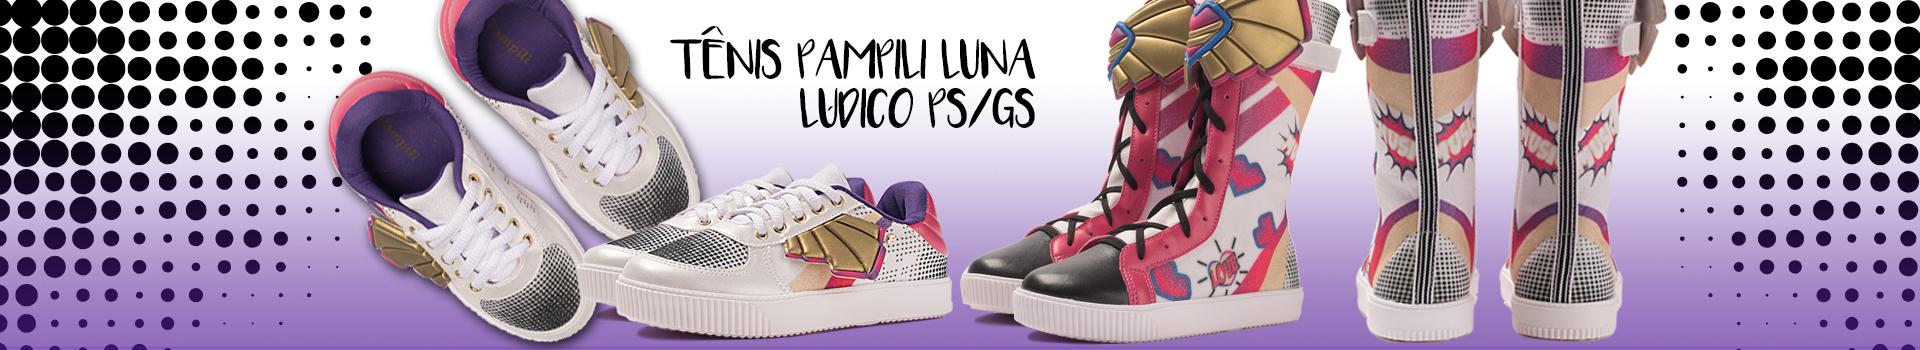 Pampili_Luna_Ludico